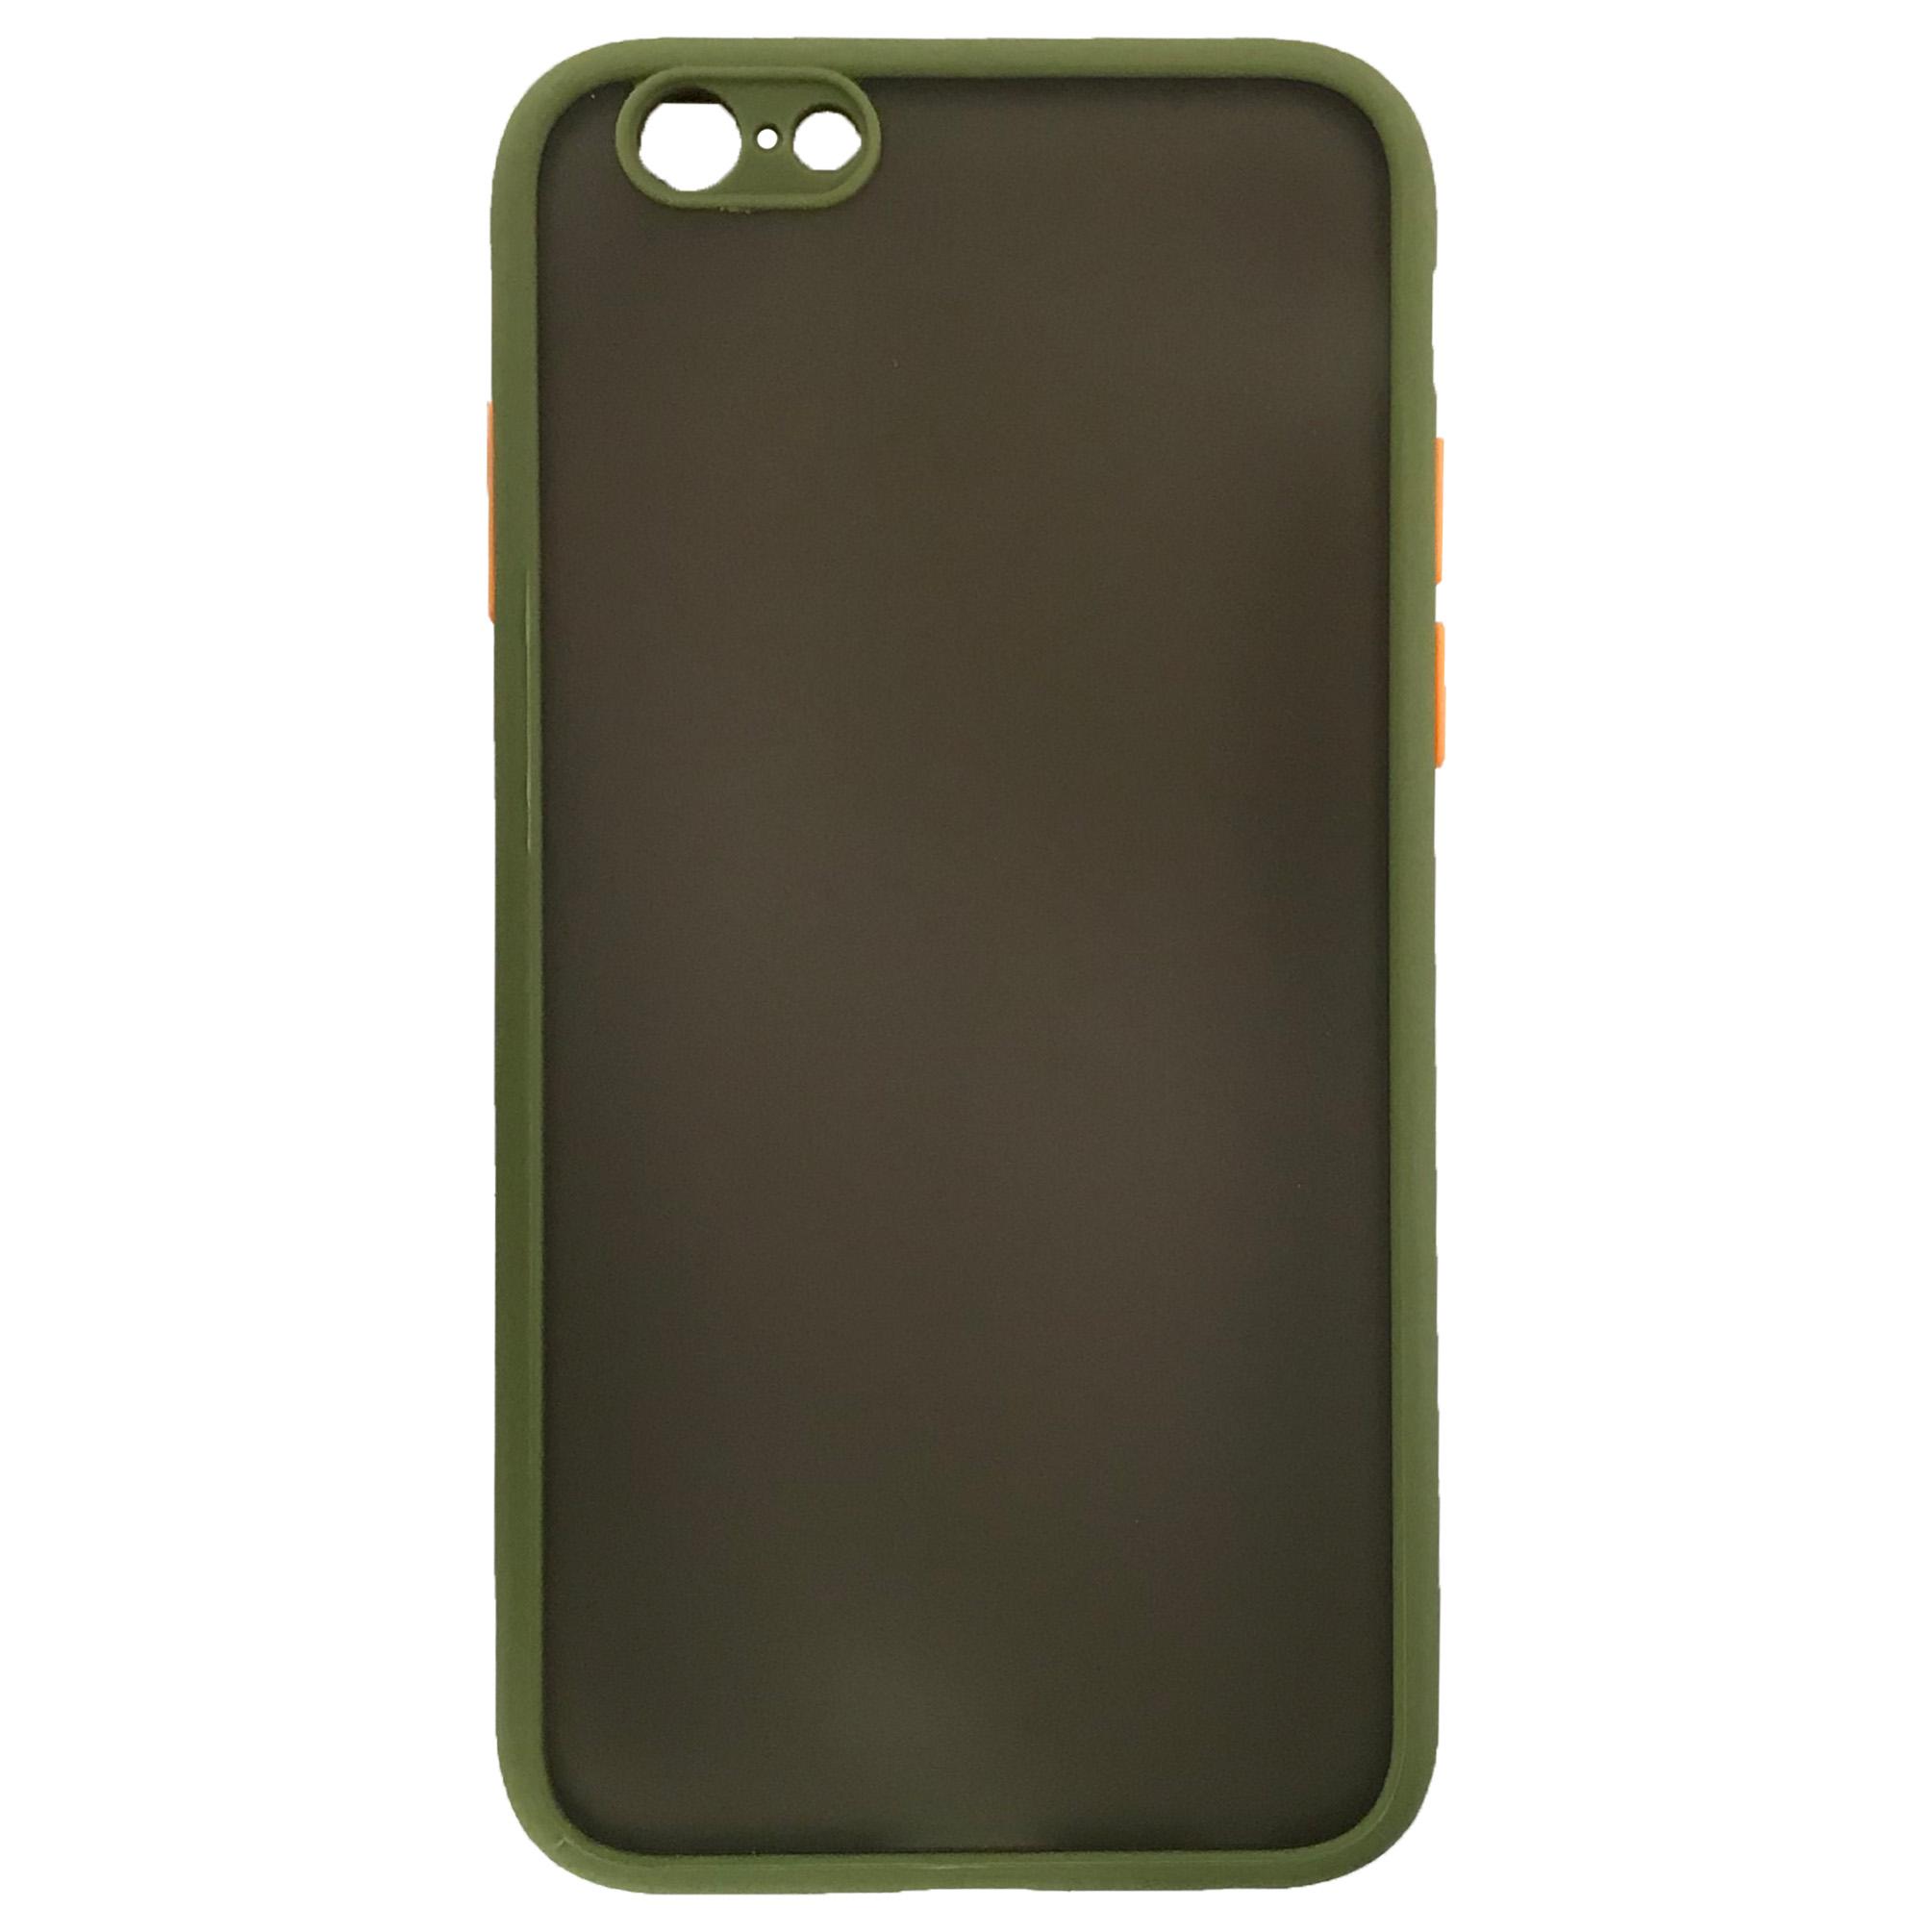 کاور مدل PM-6s مناسب برای گوشی موبایل اپل iPhone 6/6s main 1 4